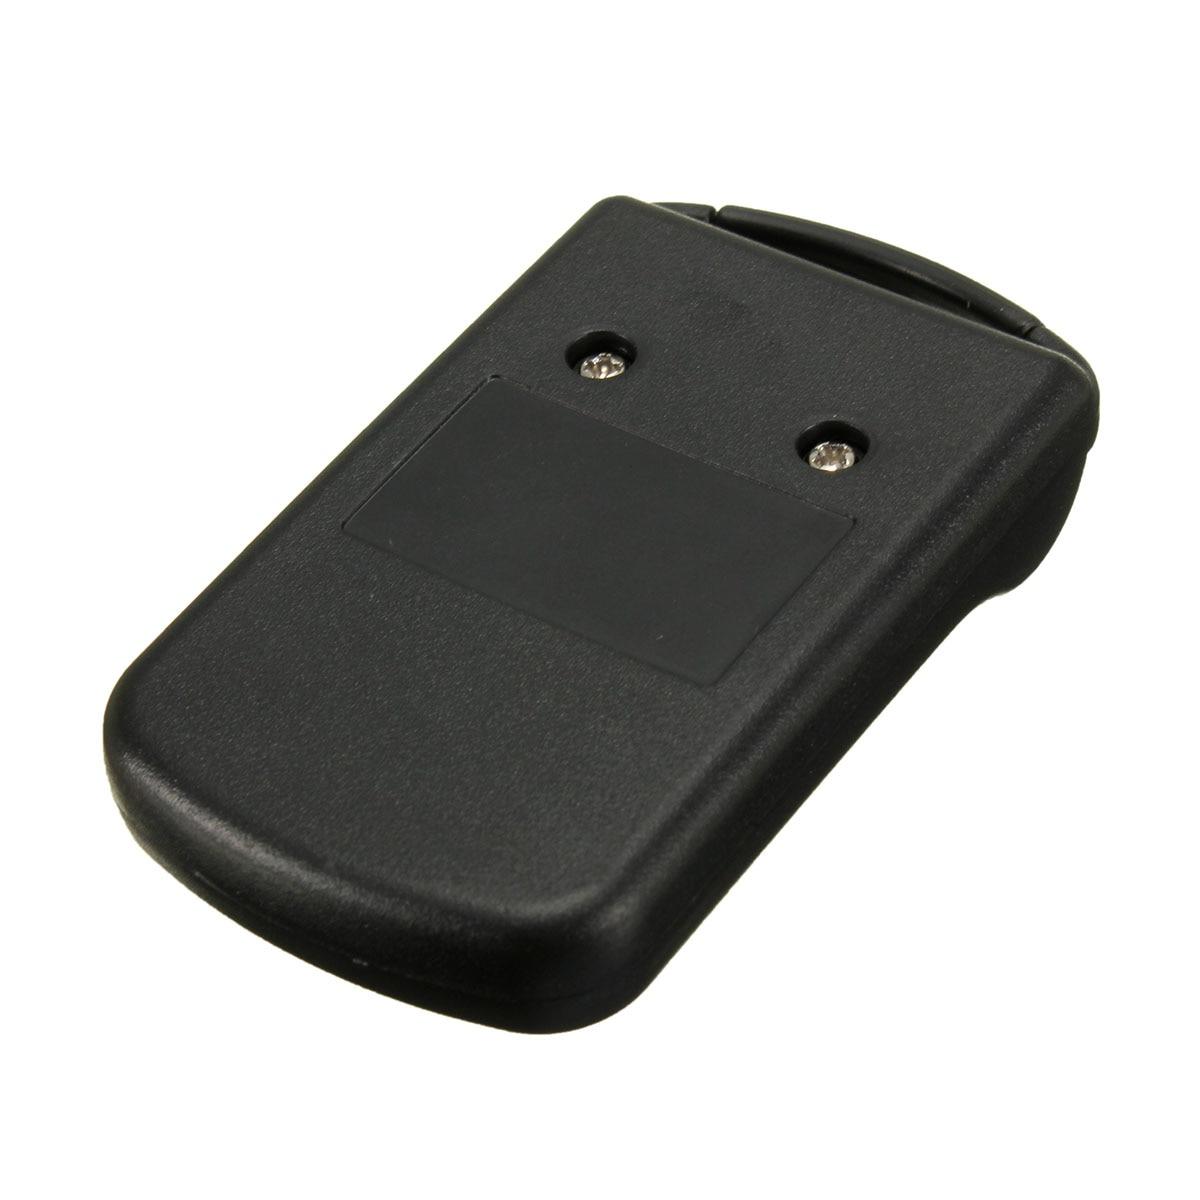 image code door keychain remote ebay opener multicode transmitter mini multi garage